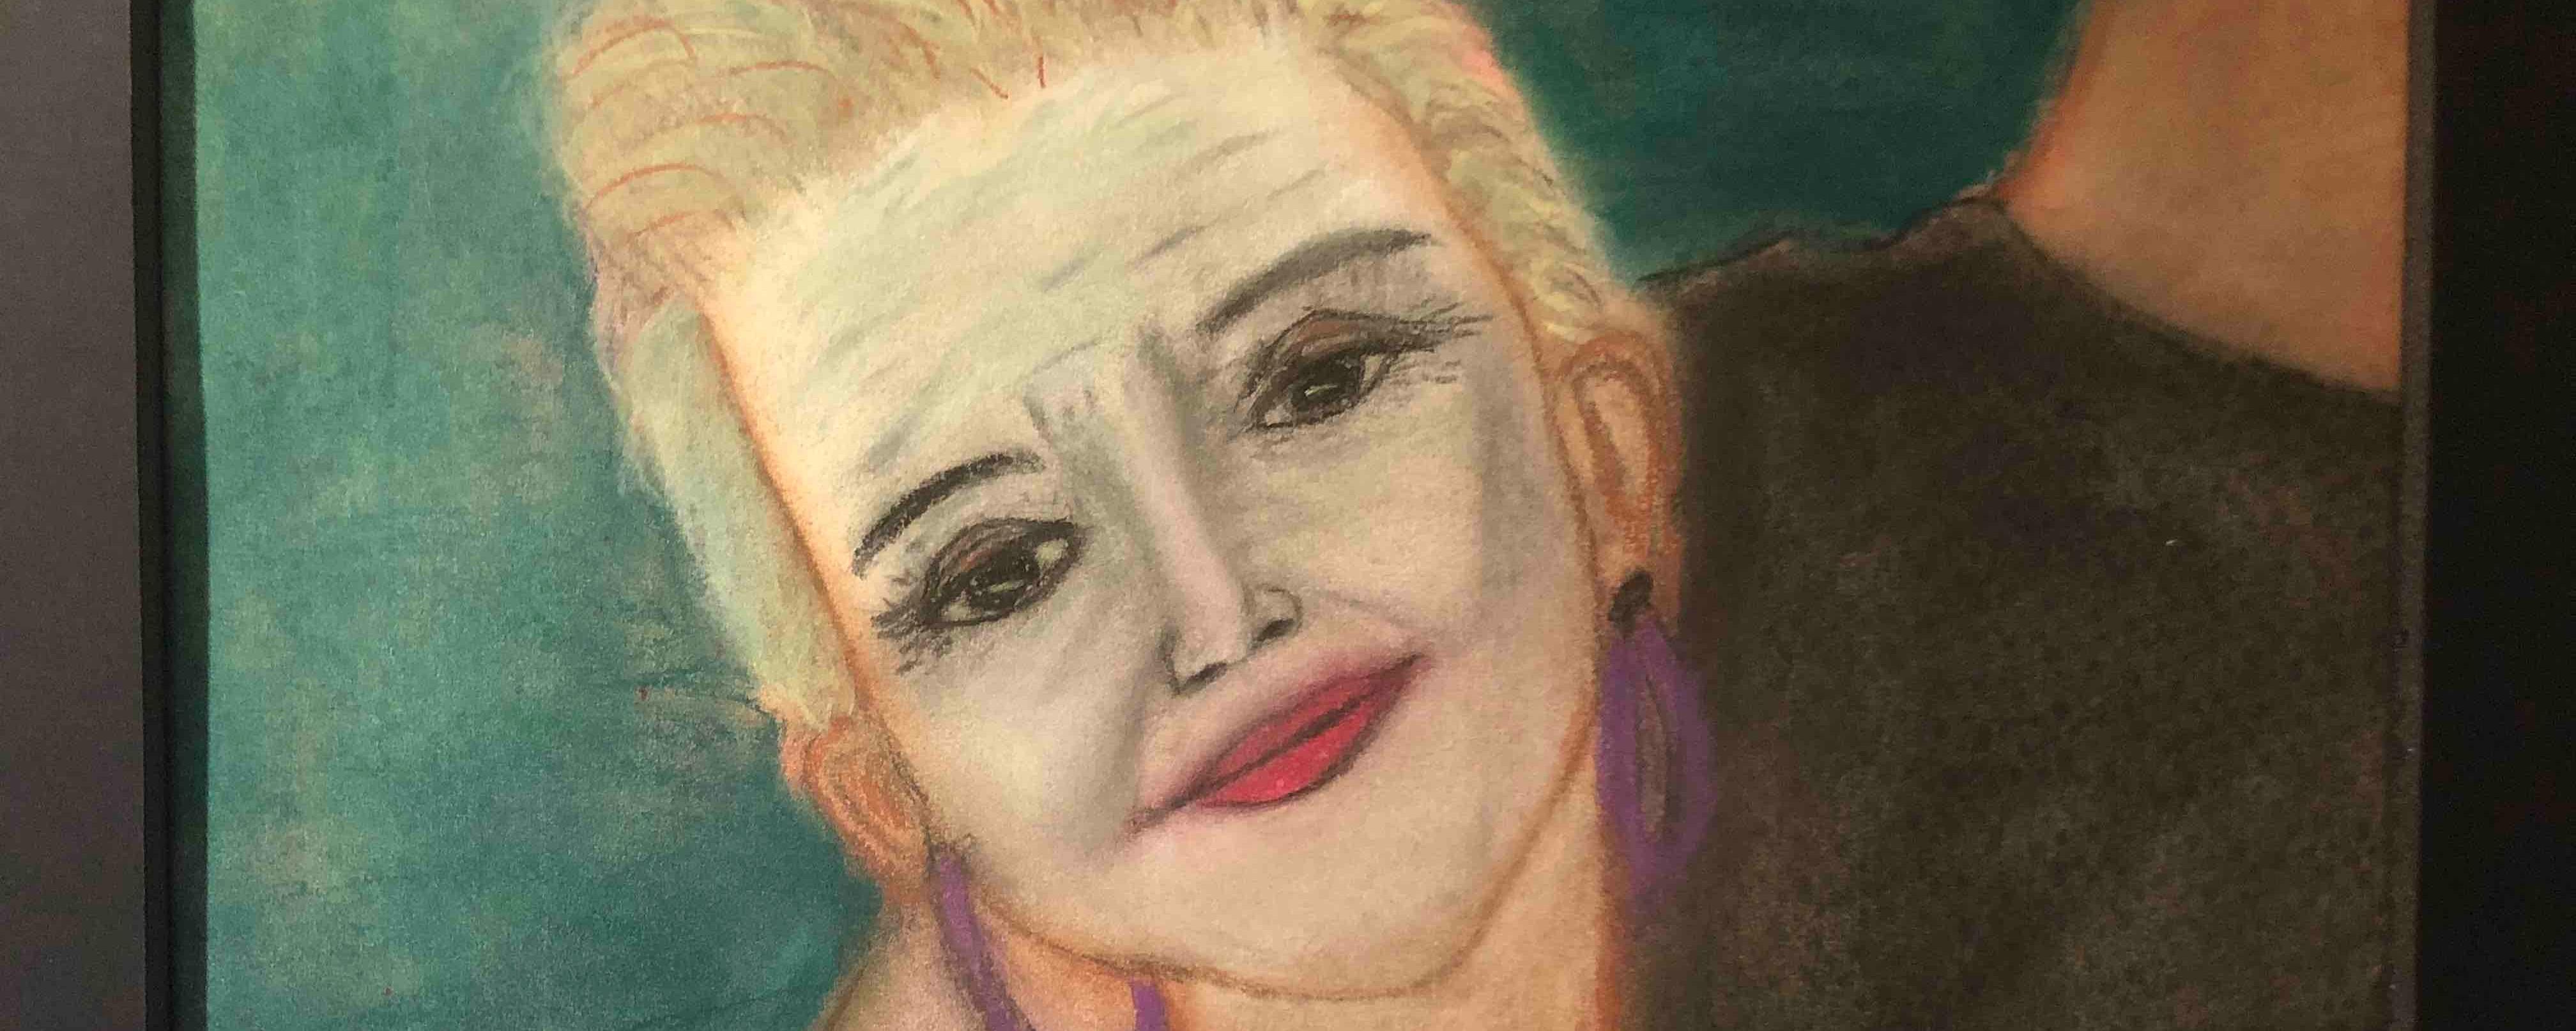 Victorian Prisoners Put On An Art Show About Unfailing Love